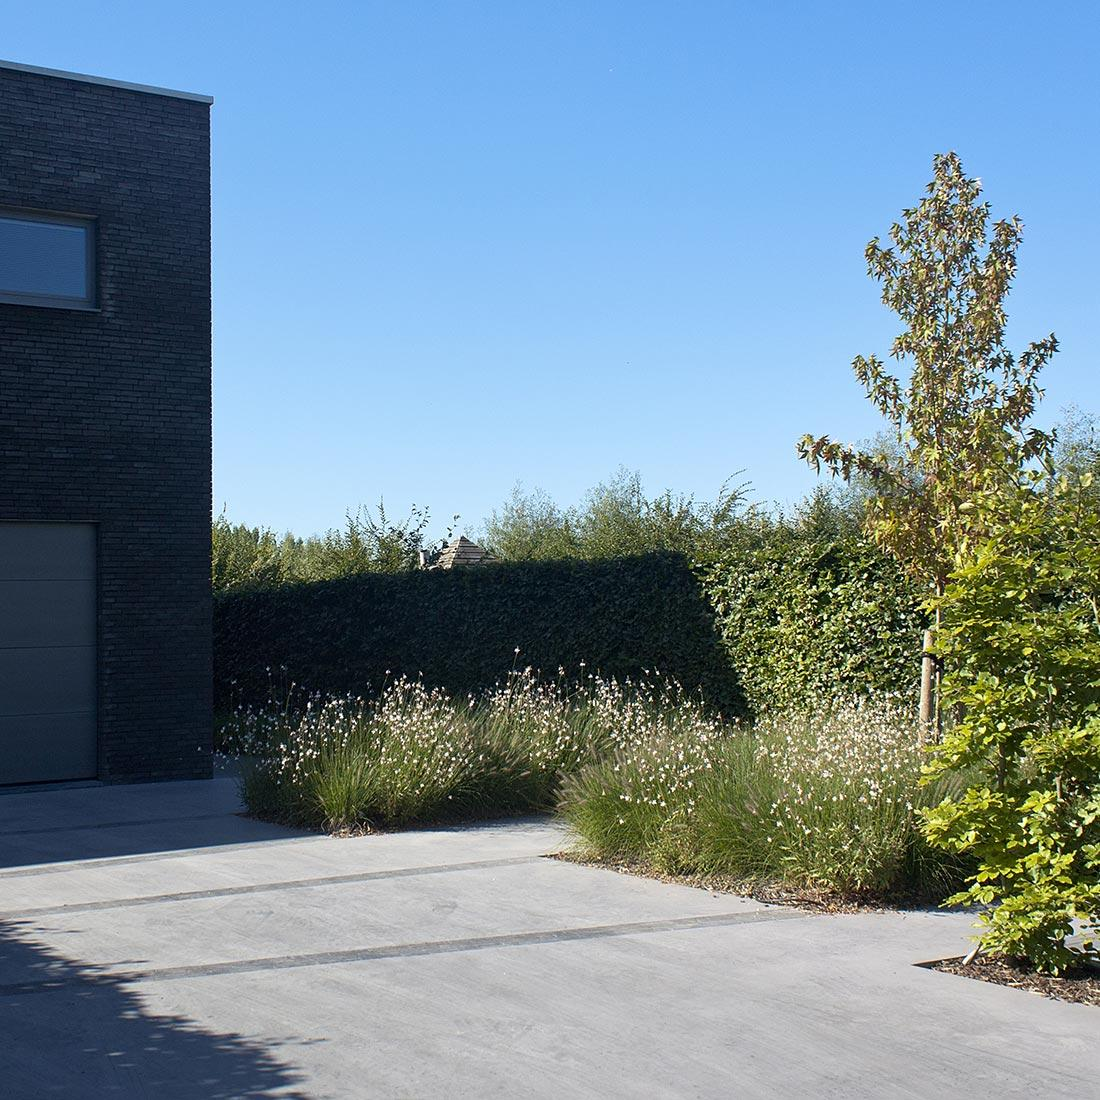 Polybeton-natuurlijk-tuin-tuinontwerp-156-50.jpg